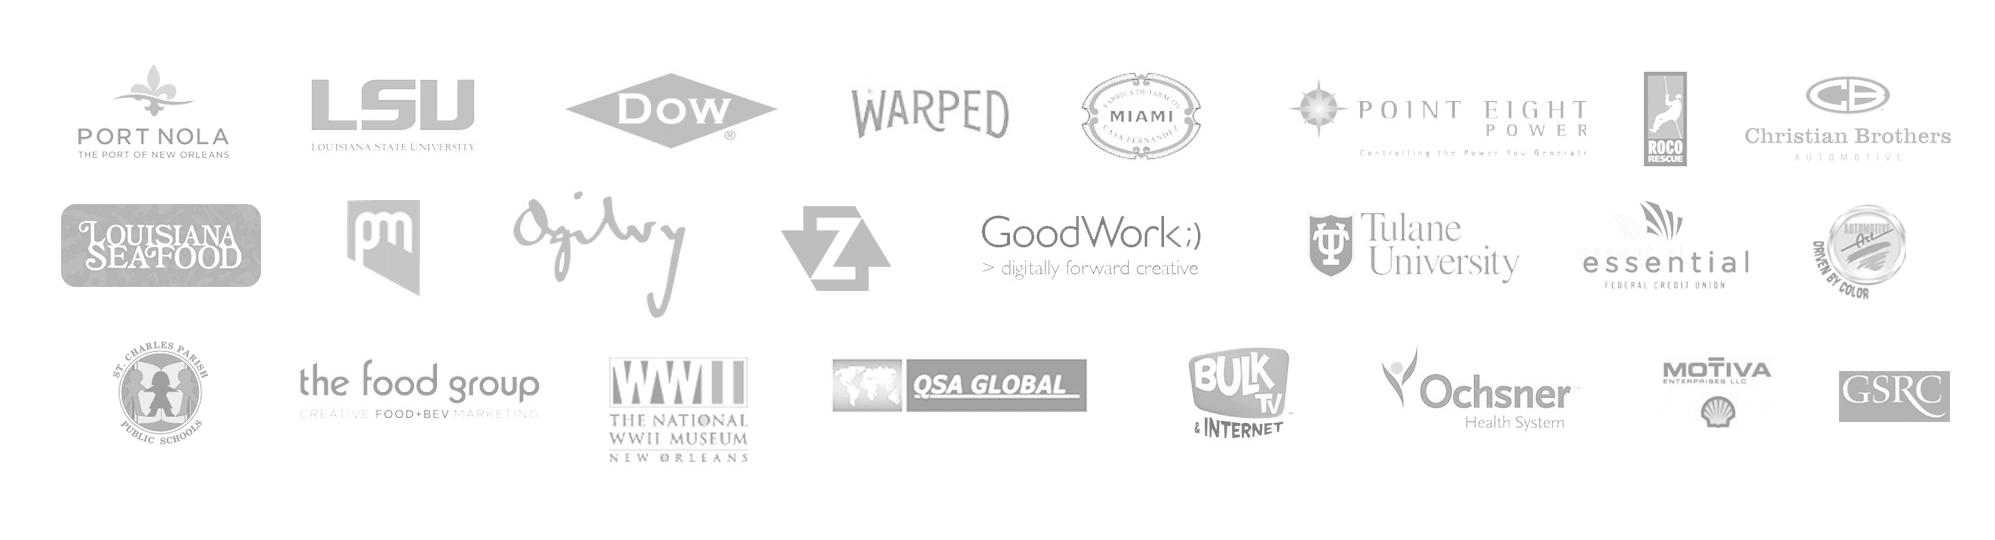 exhibit design company client logos